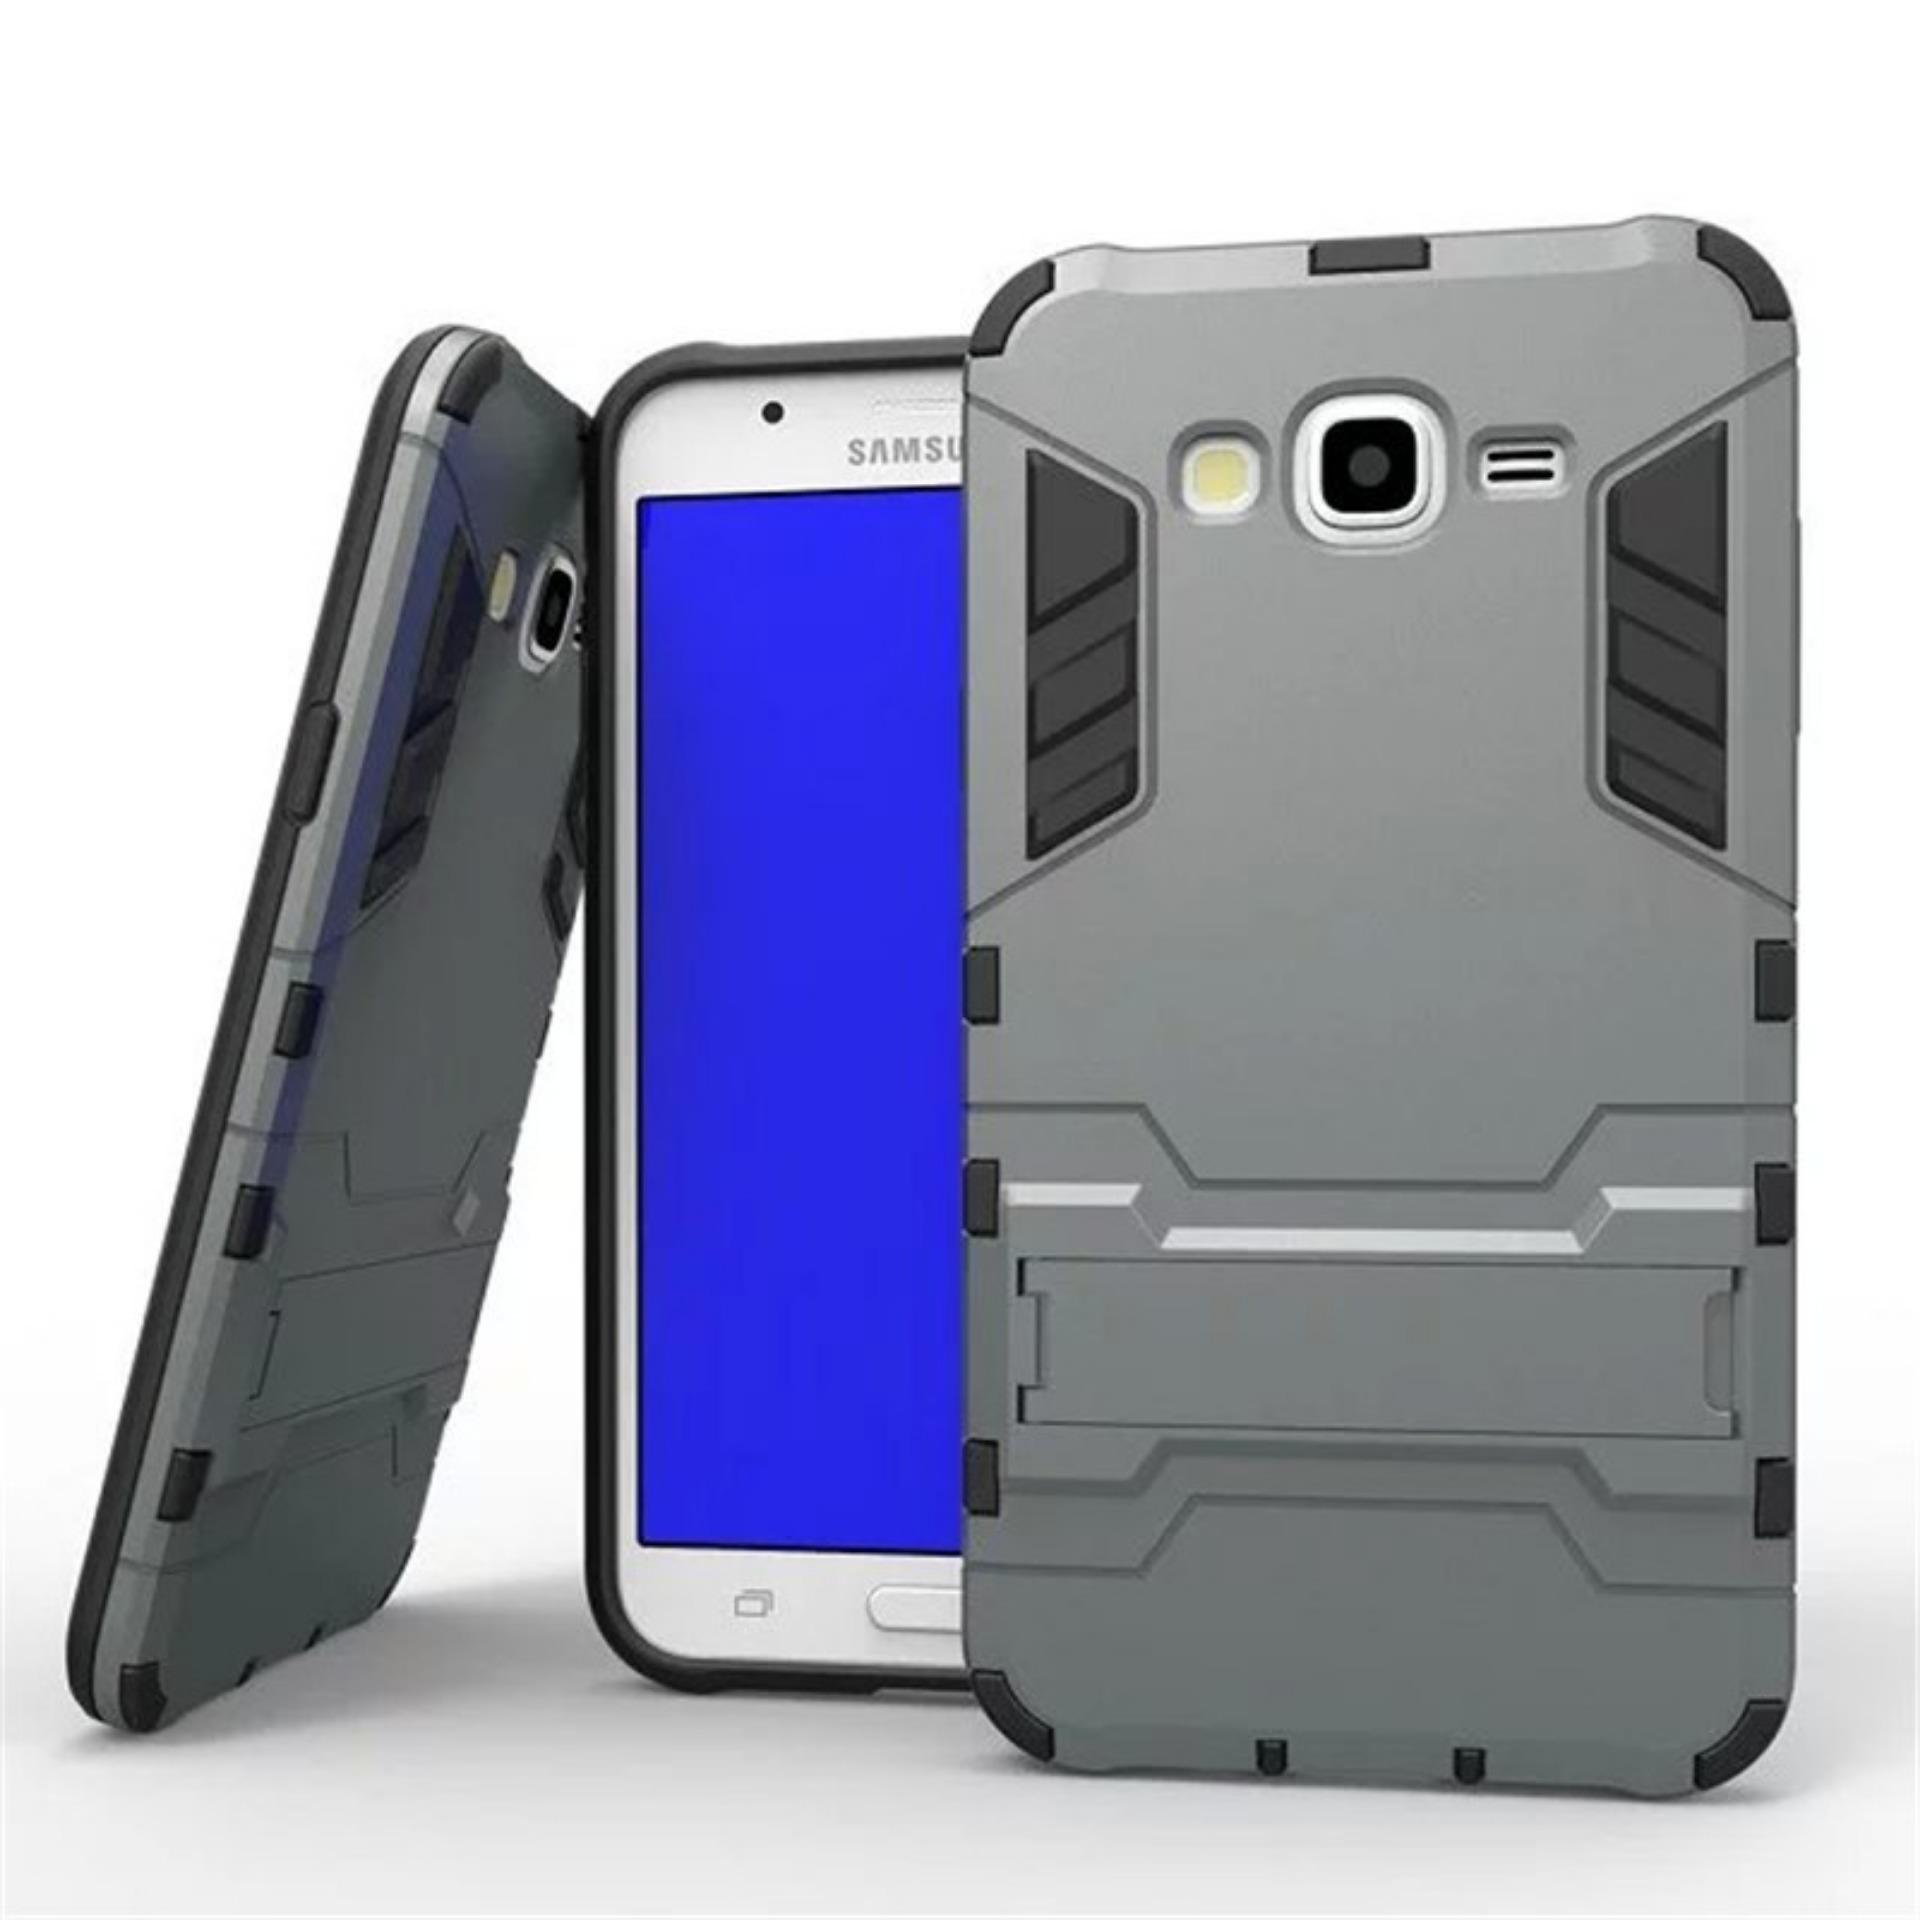 Transformers Case Standing Vivo Y55 Abu Daftar Harga Merah Back Samsung Galaxy J7 2015 J700 Iron Man Kick Stand